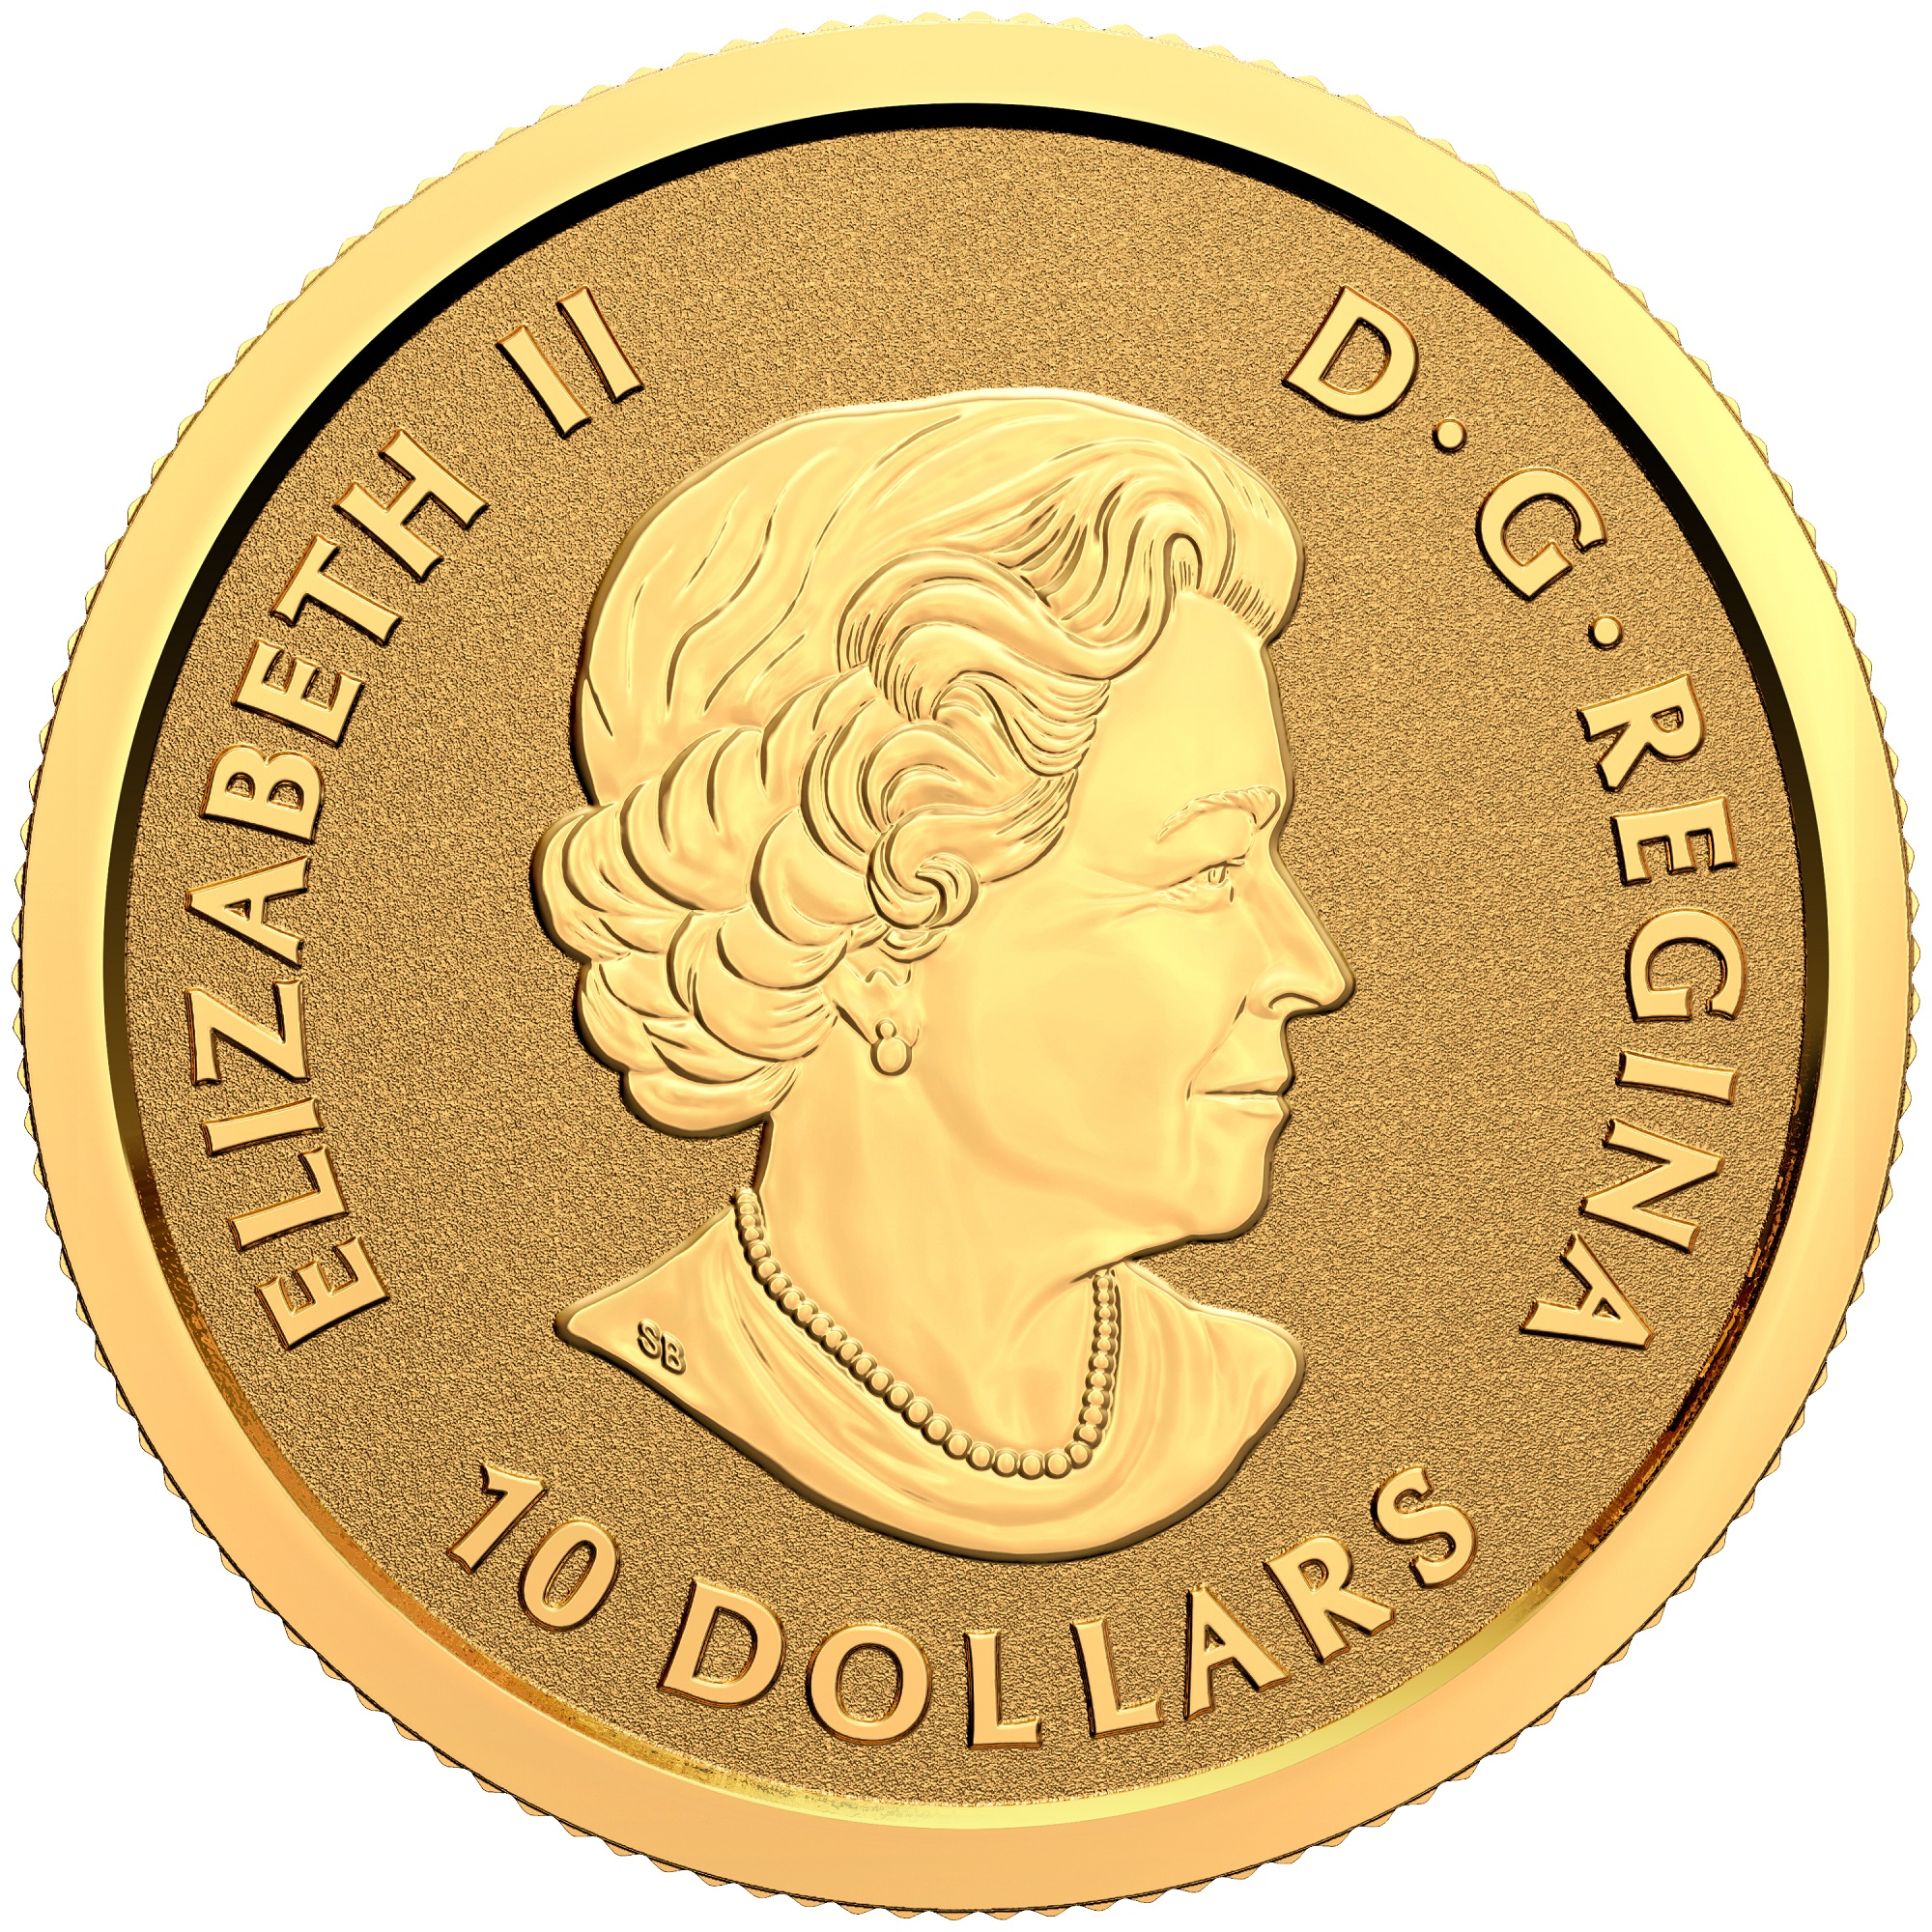 CA 10 Dollars 2021